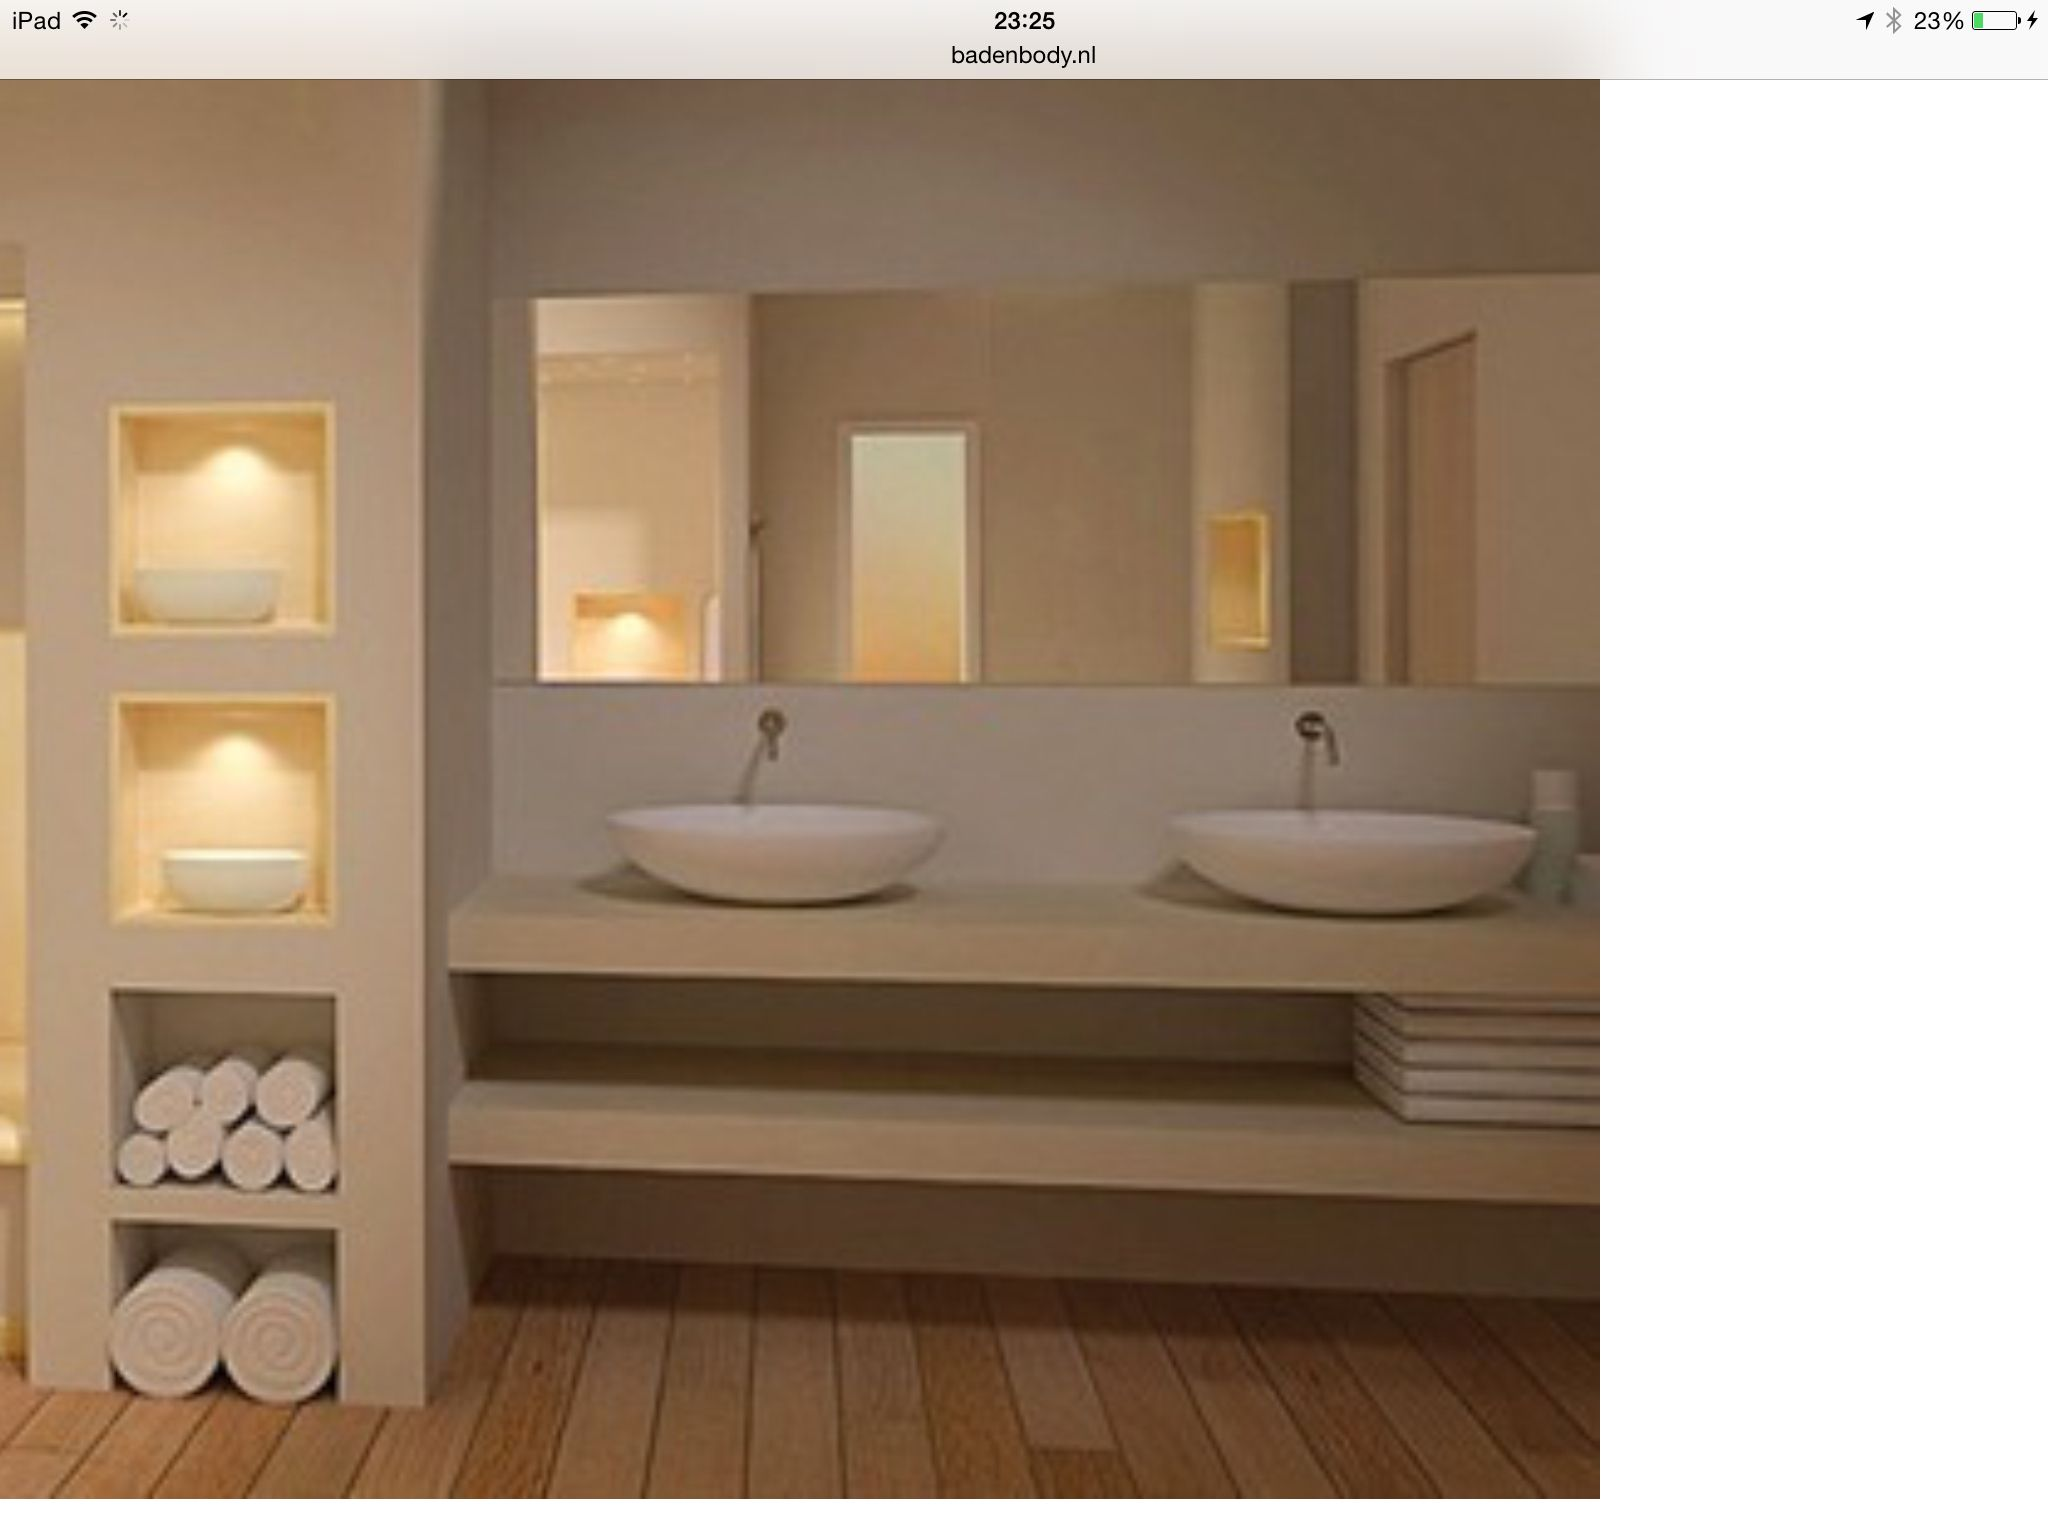 Badkamer Sanitair Karwei : Badkamer spotjes karwei: badkamer sint nicolaasga iksopar. beste